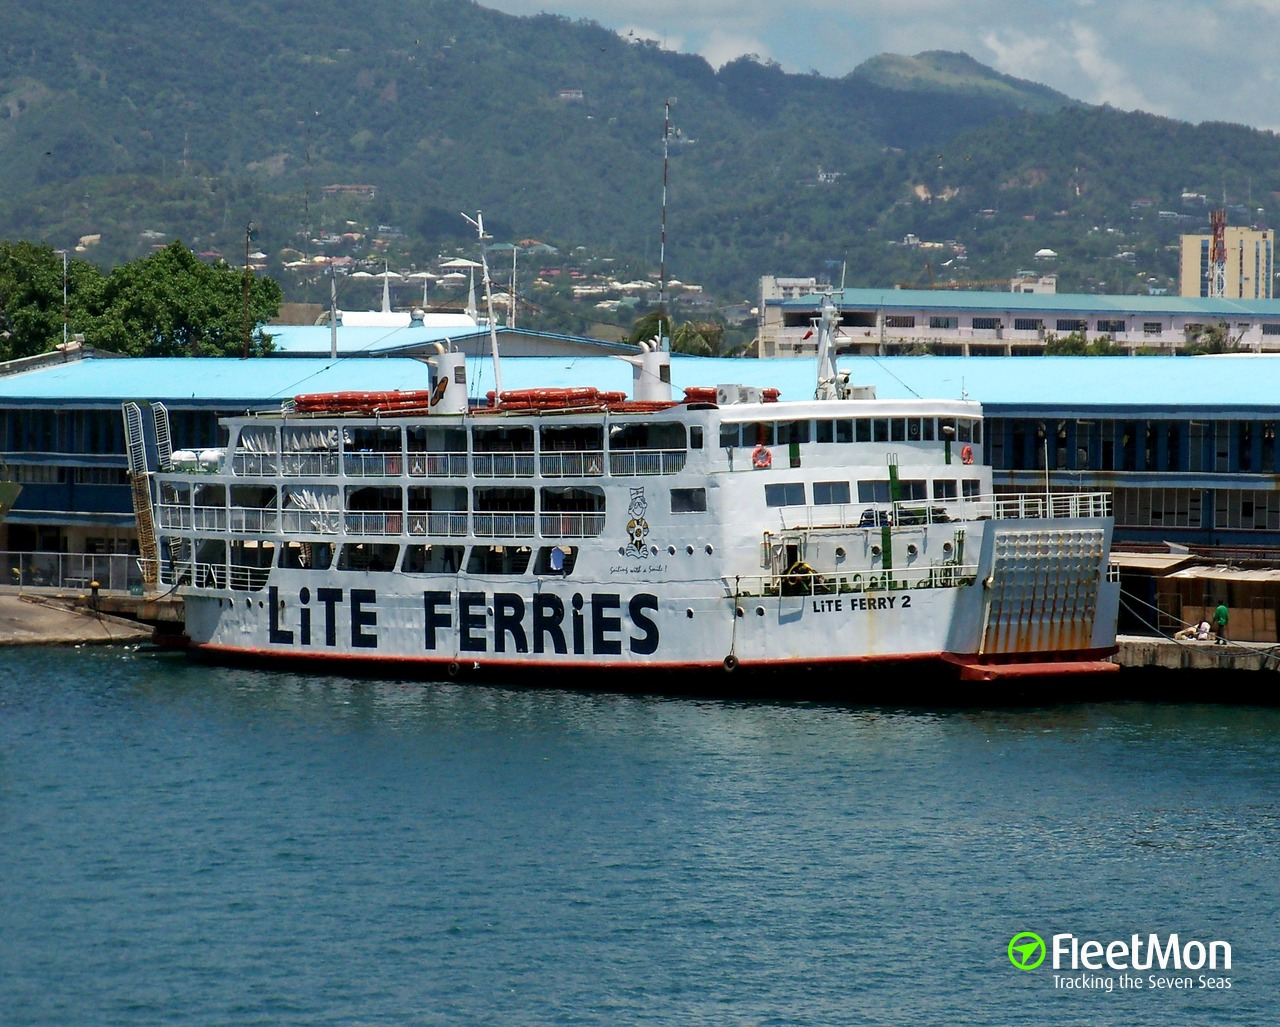 Navire LITE FERRY 2 (Passenger ship) IMO 1234567, MMSI 548690300